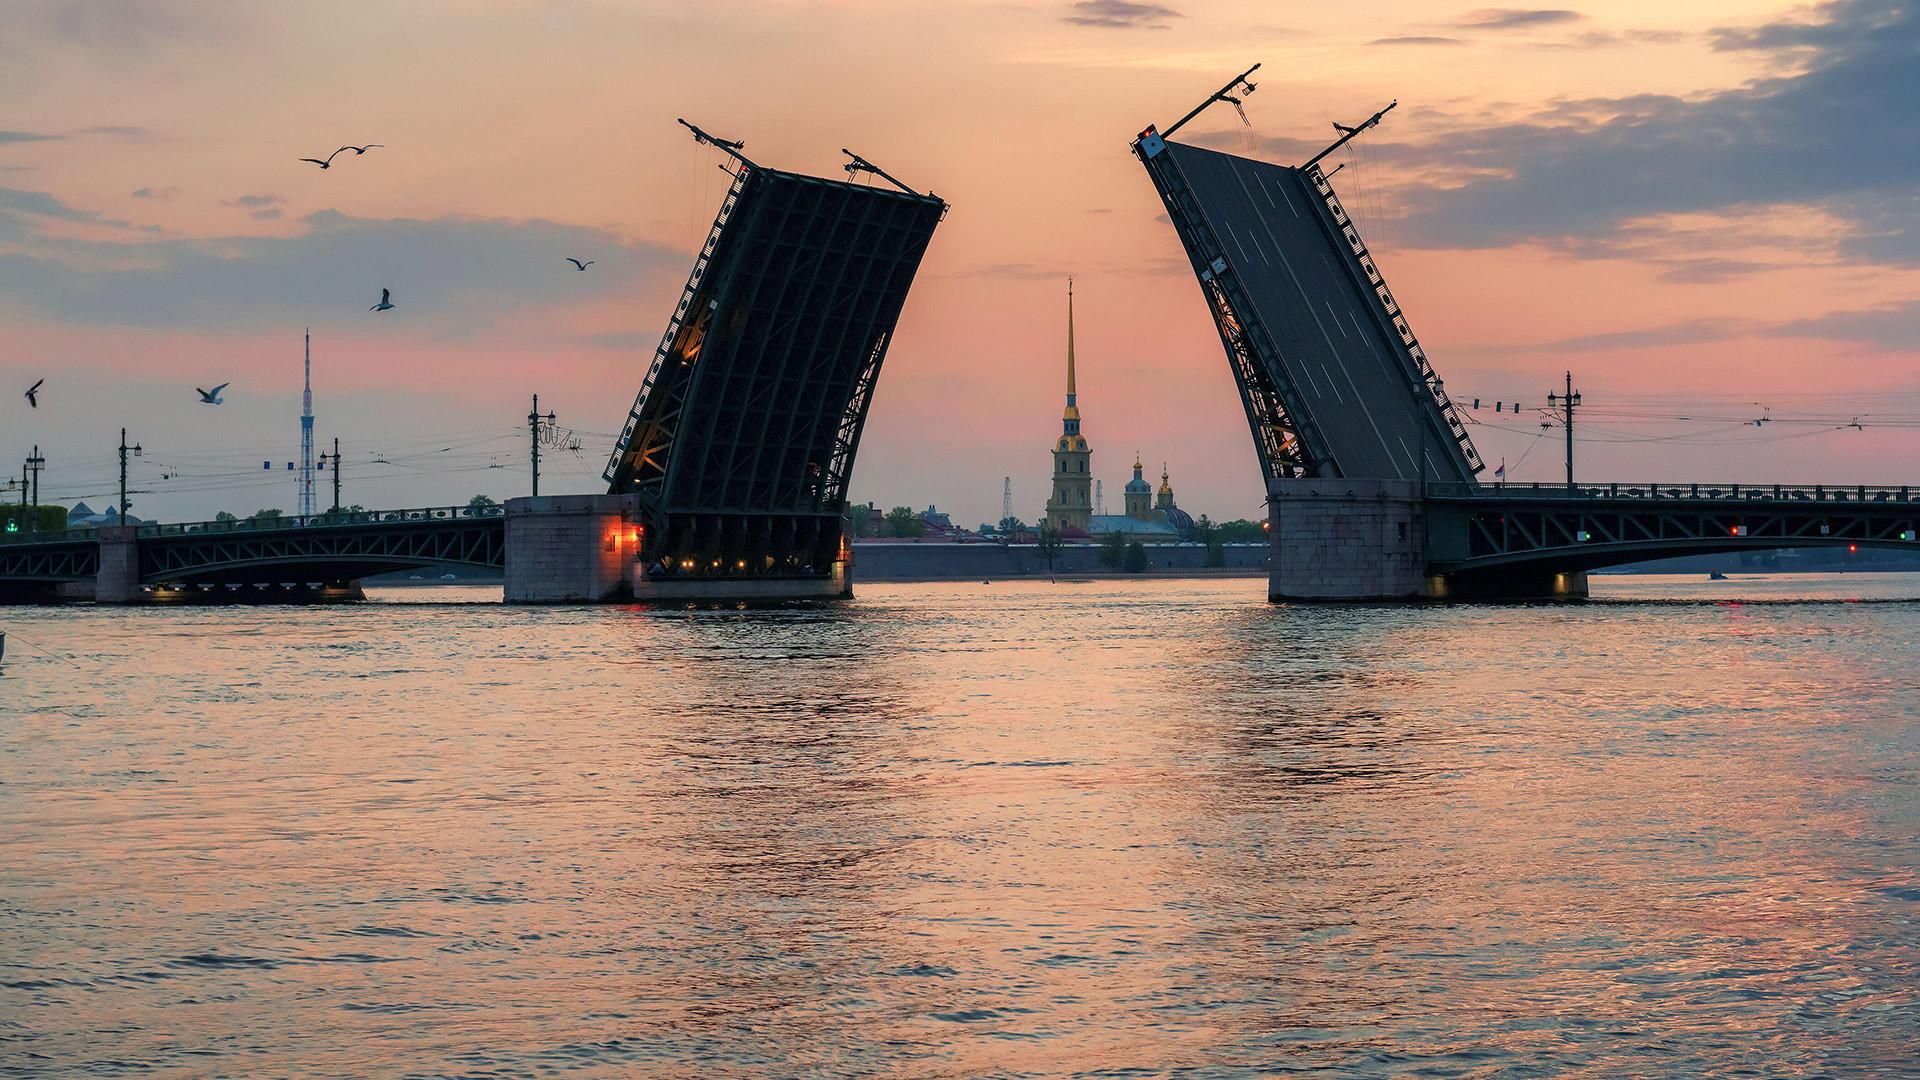 Дворски мост на Неви у белој ноћи Санкт Петербурга, Русија.